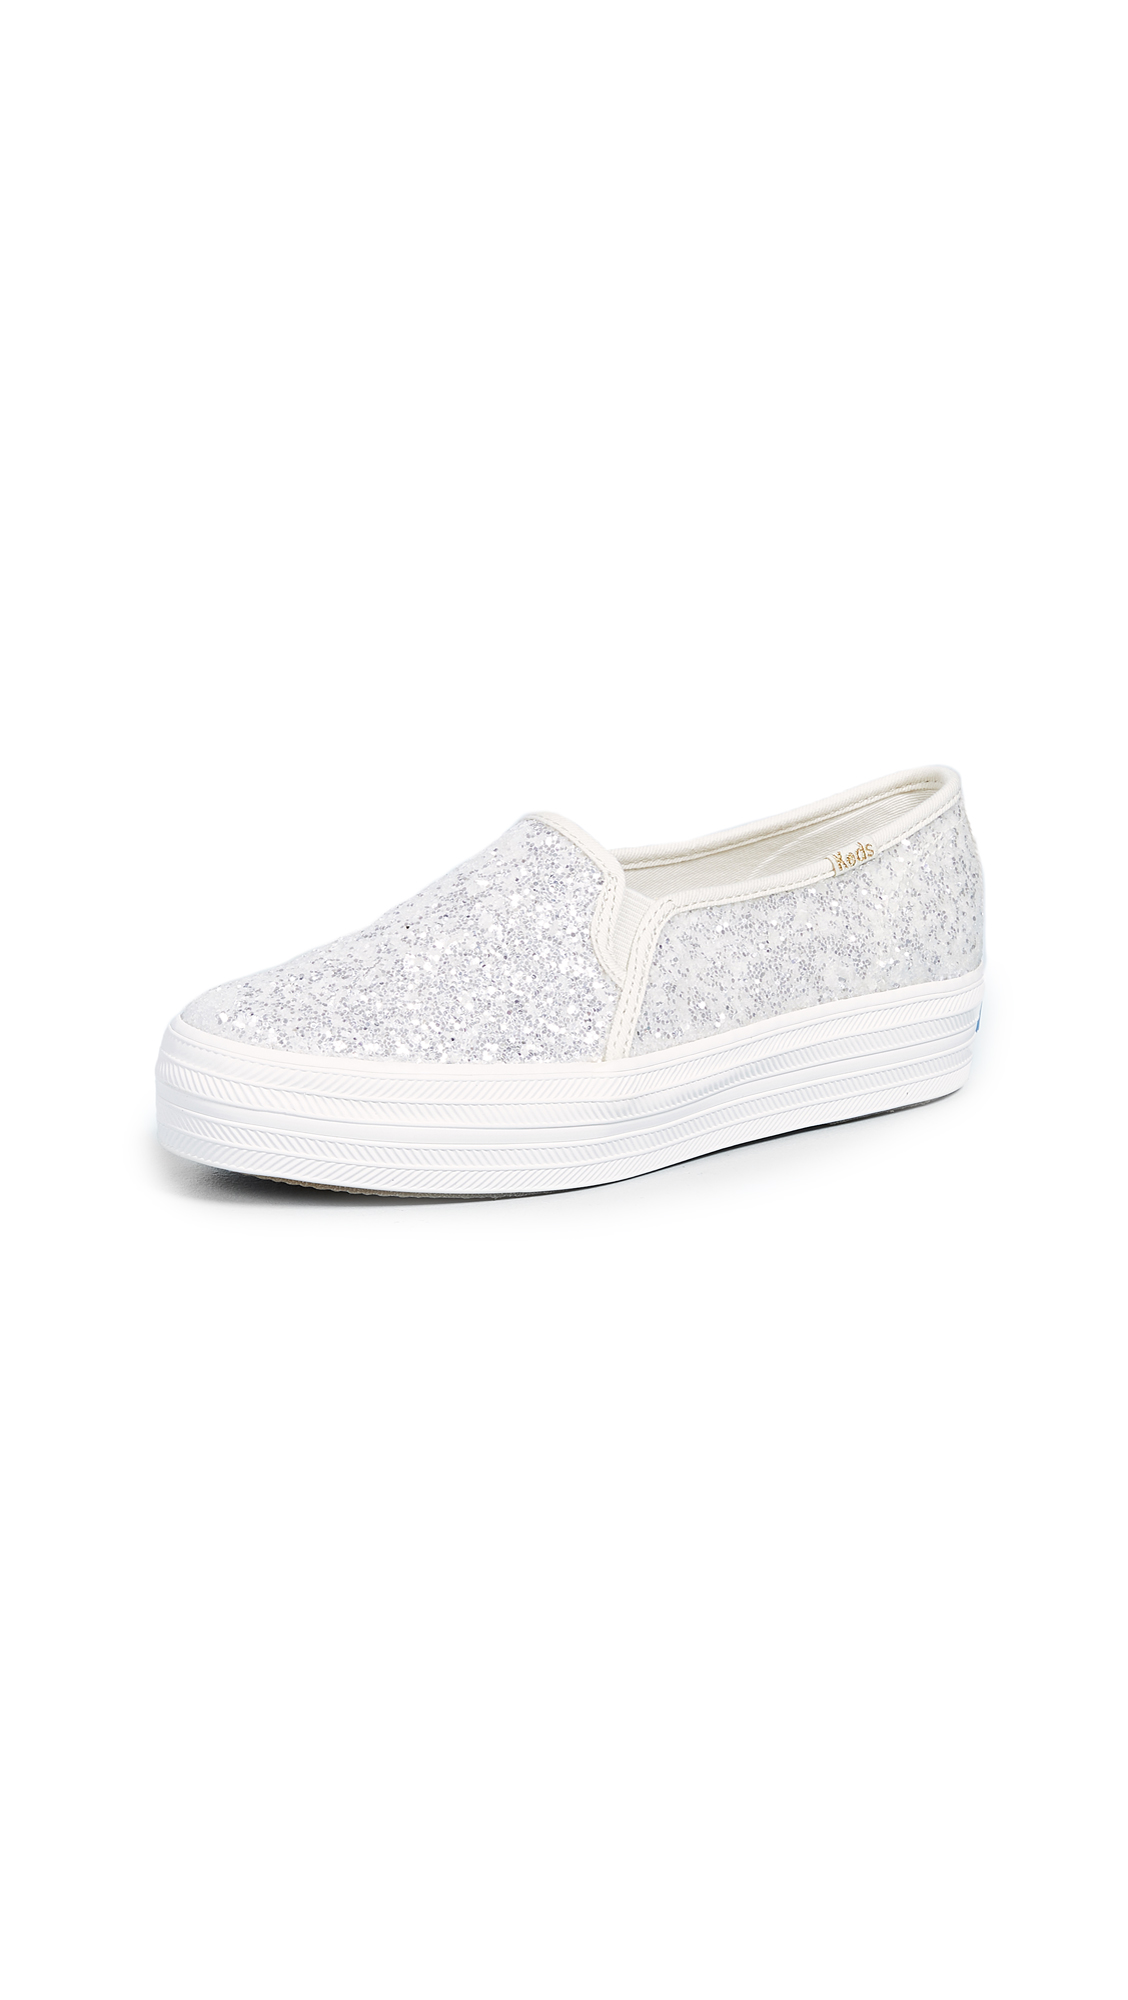 Keds x Kate Spade Triple Decker Slip On Sneakers - White